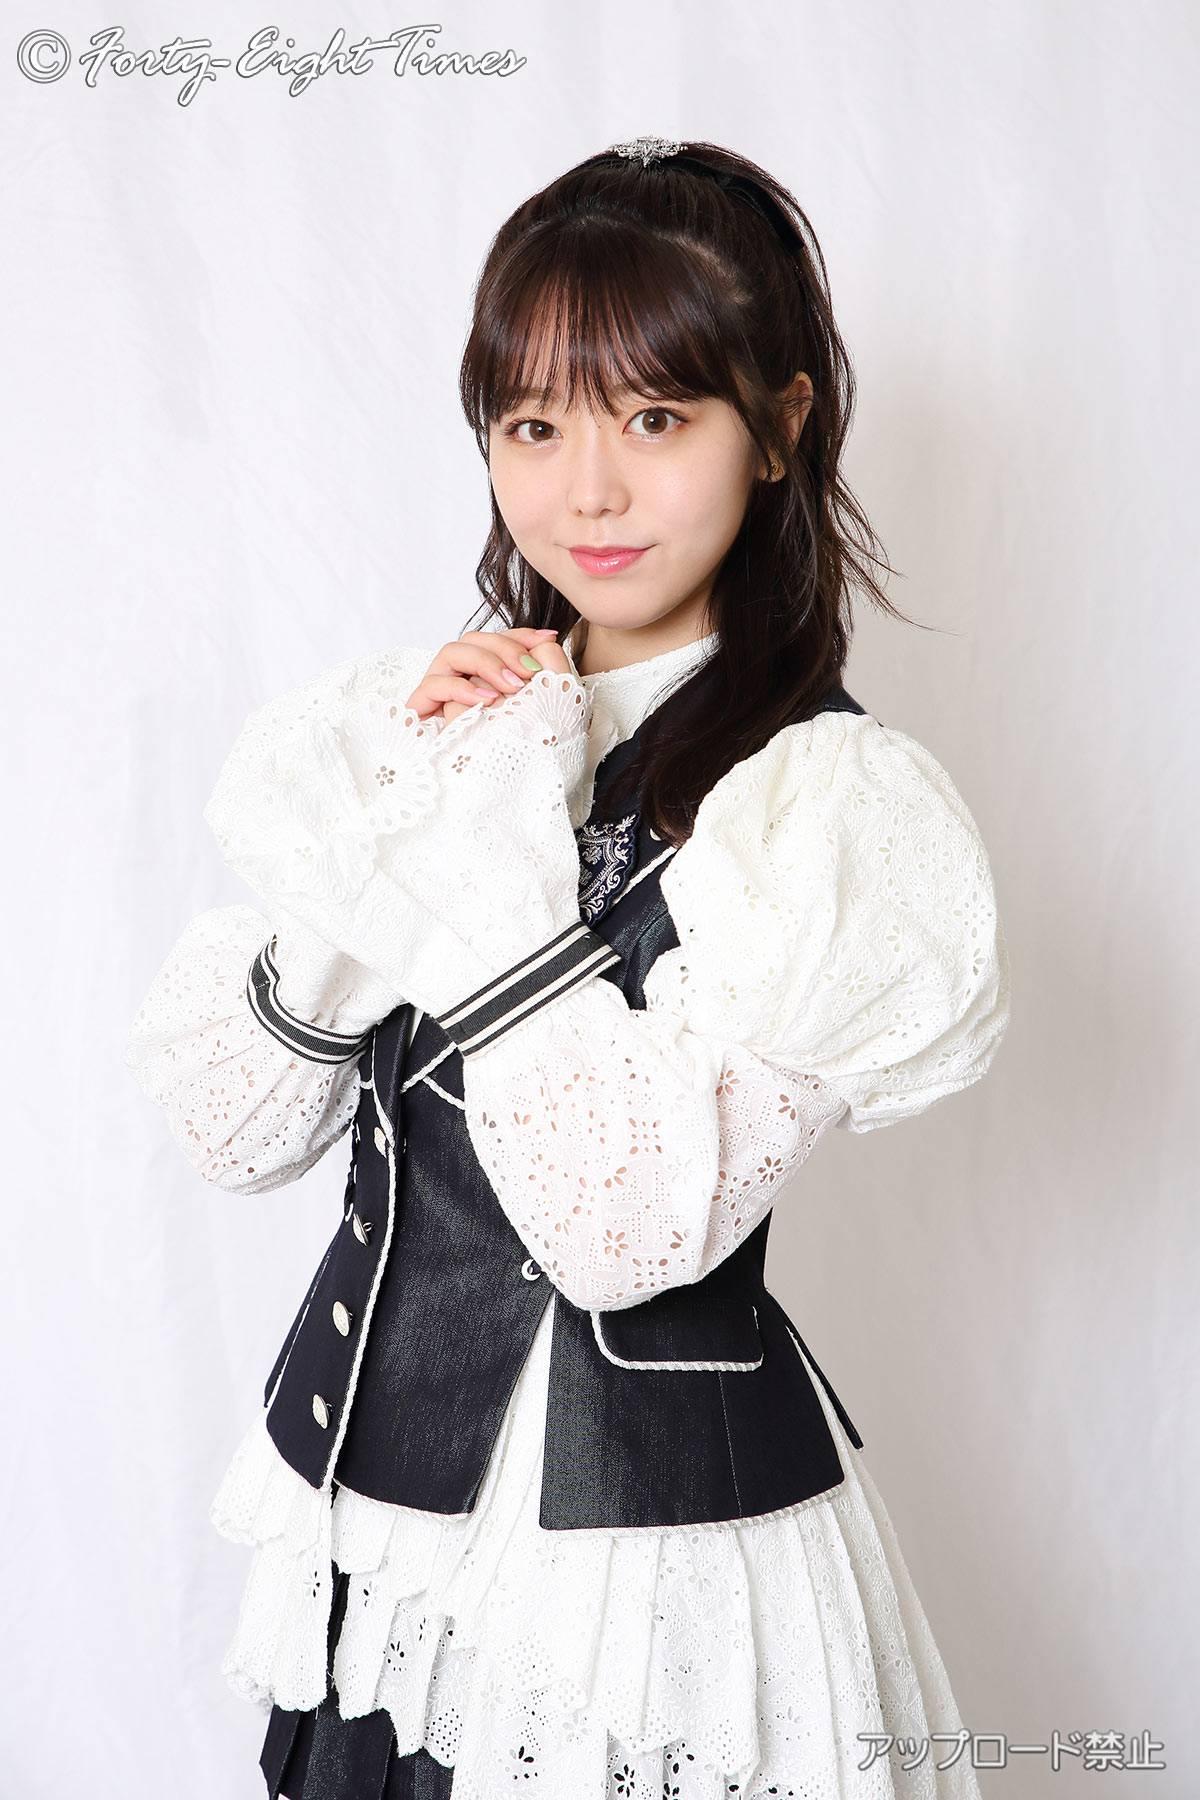 Minegishi Minami 48 Times 2105 01.jpg